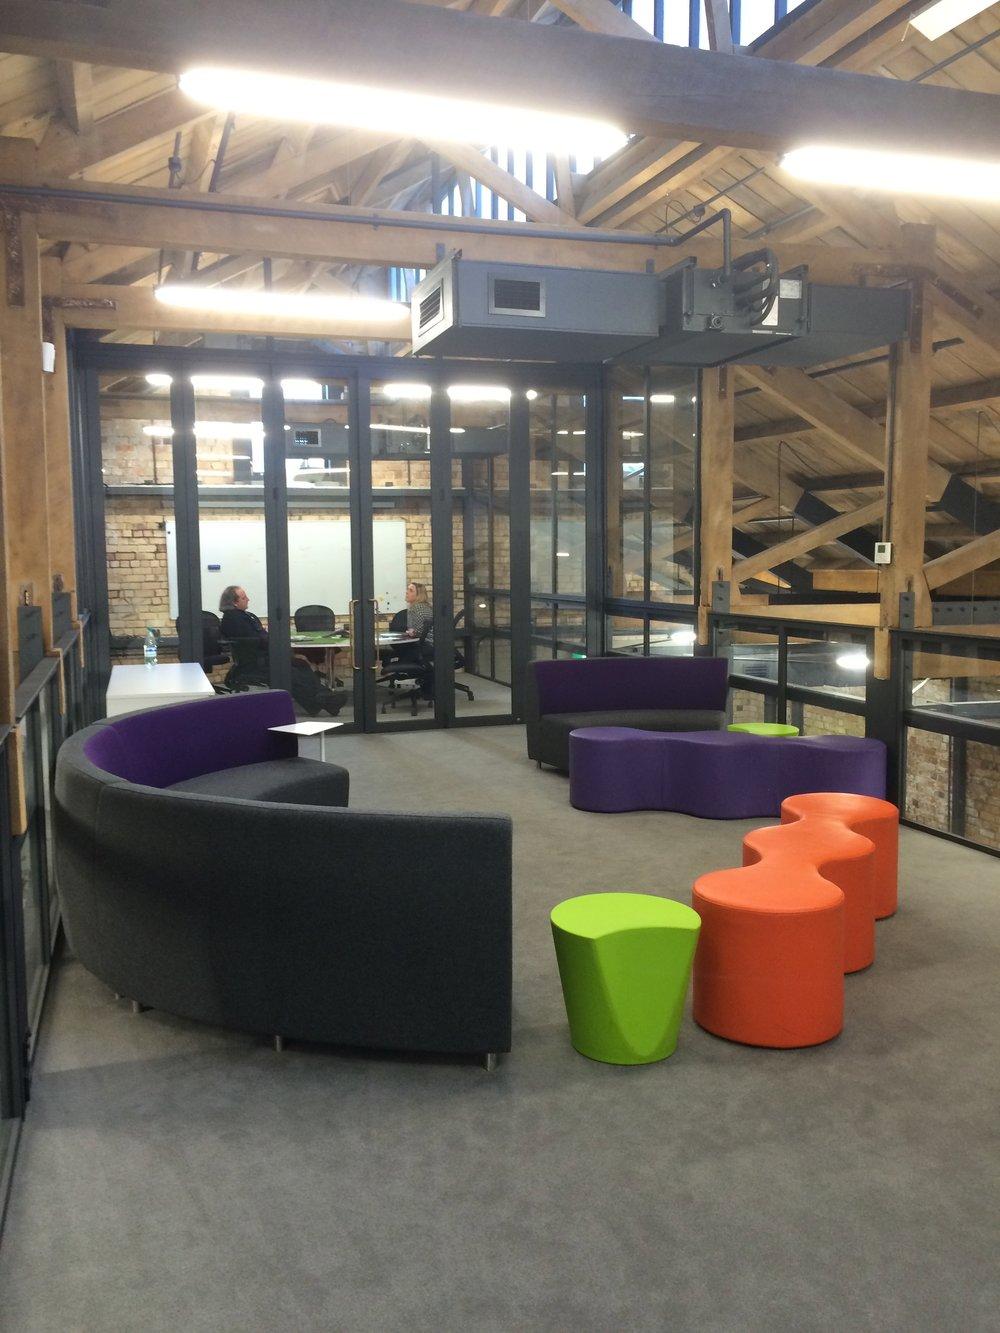 New Zealand ingenuity in interior design